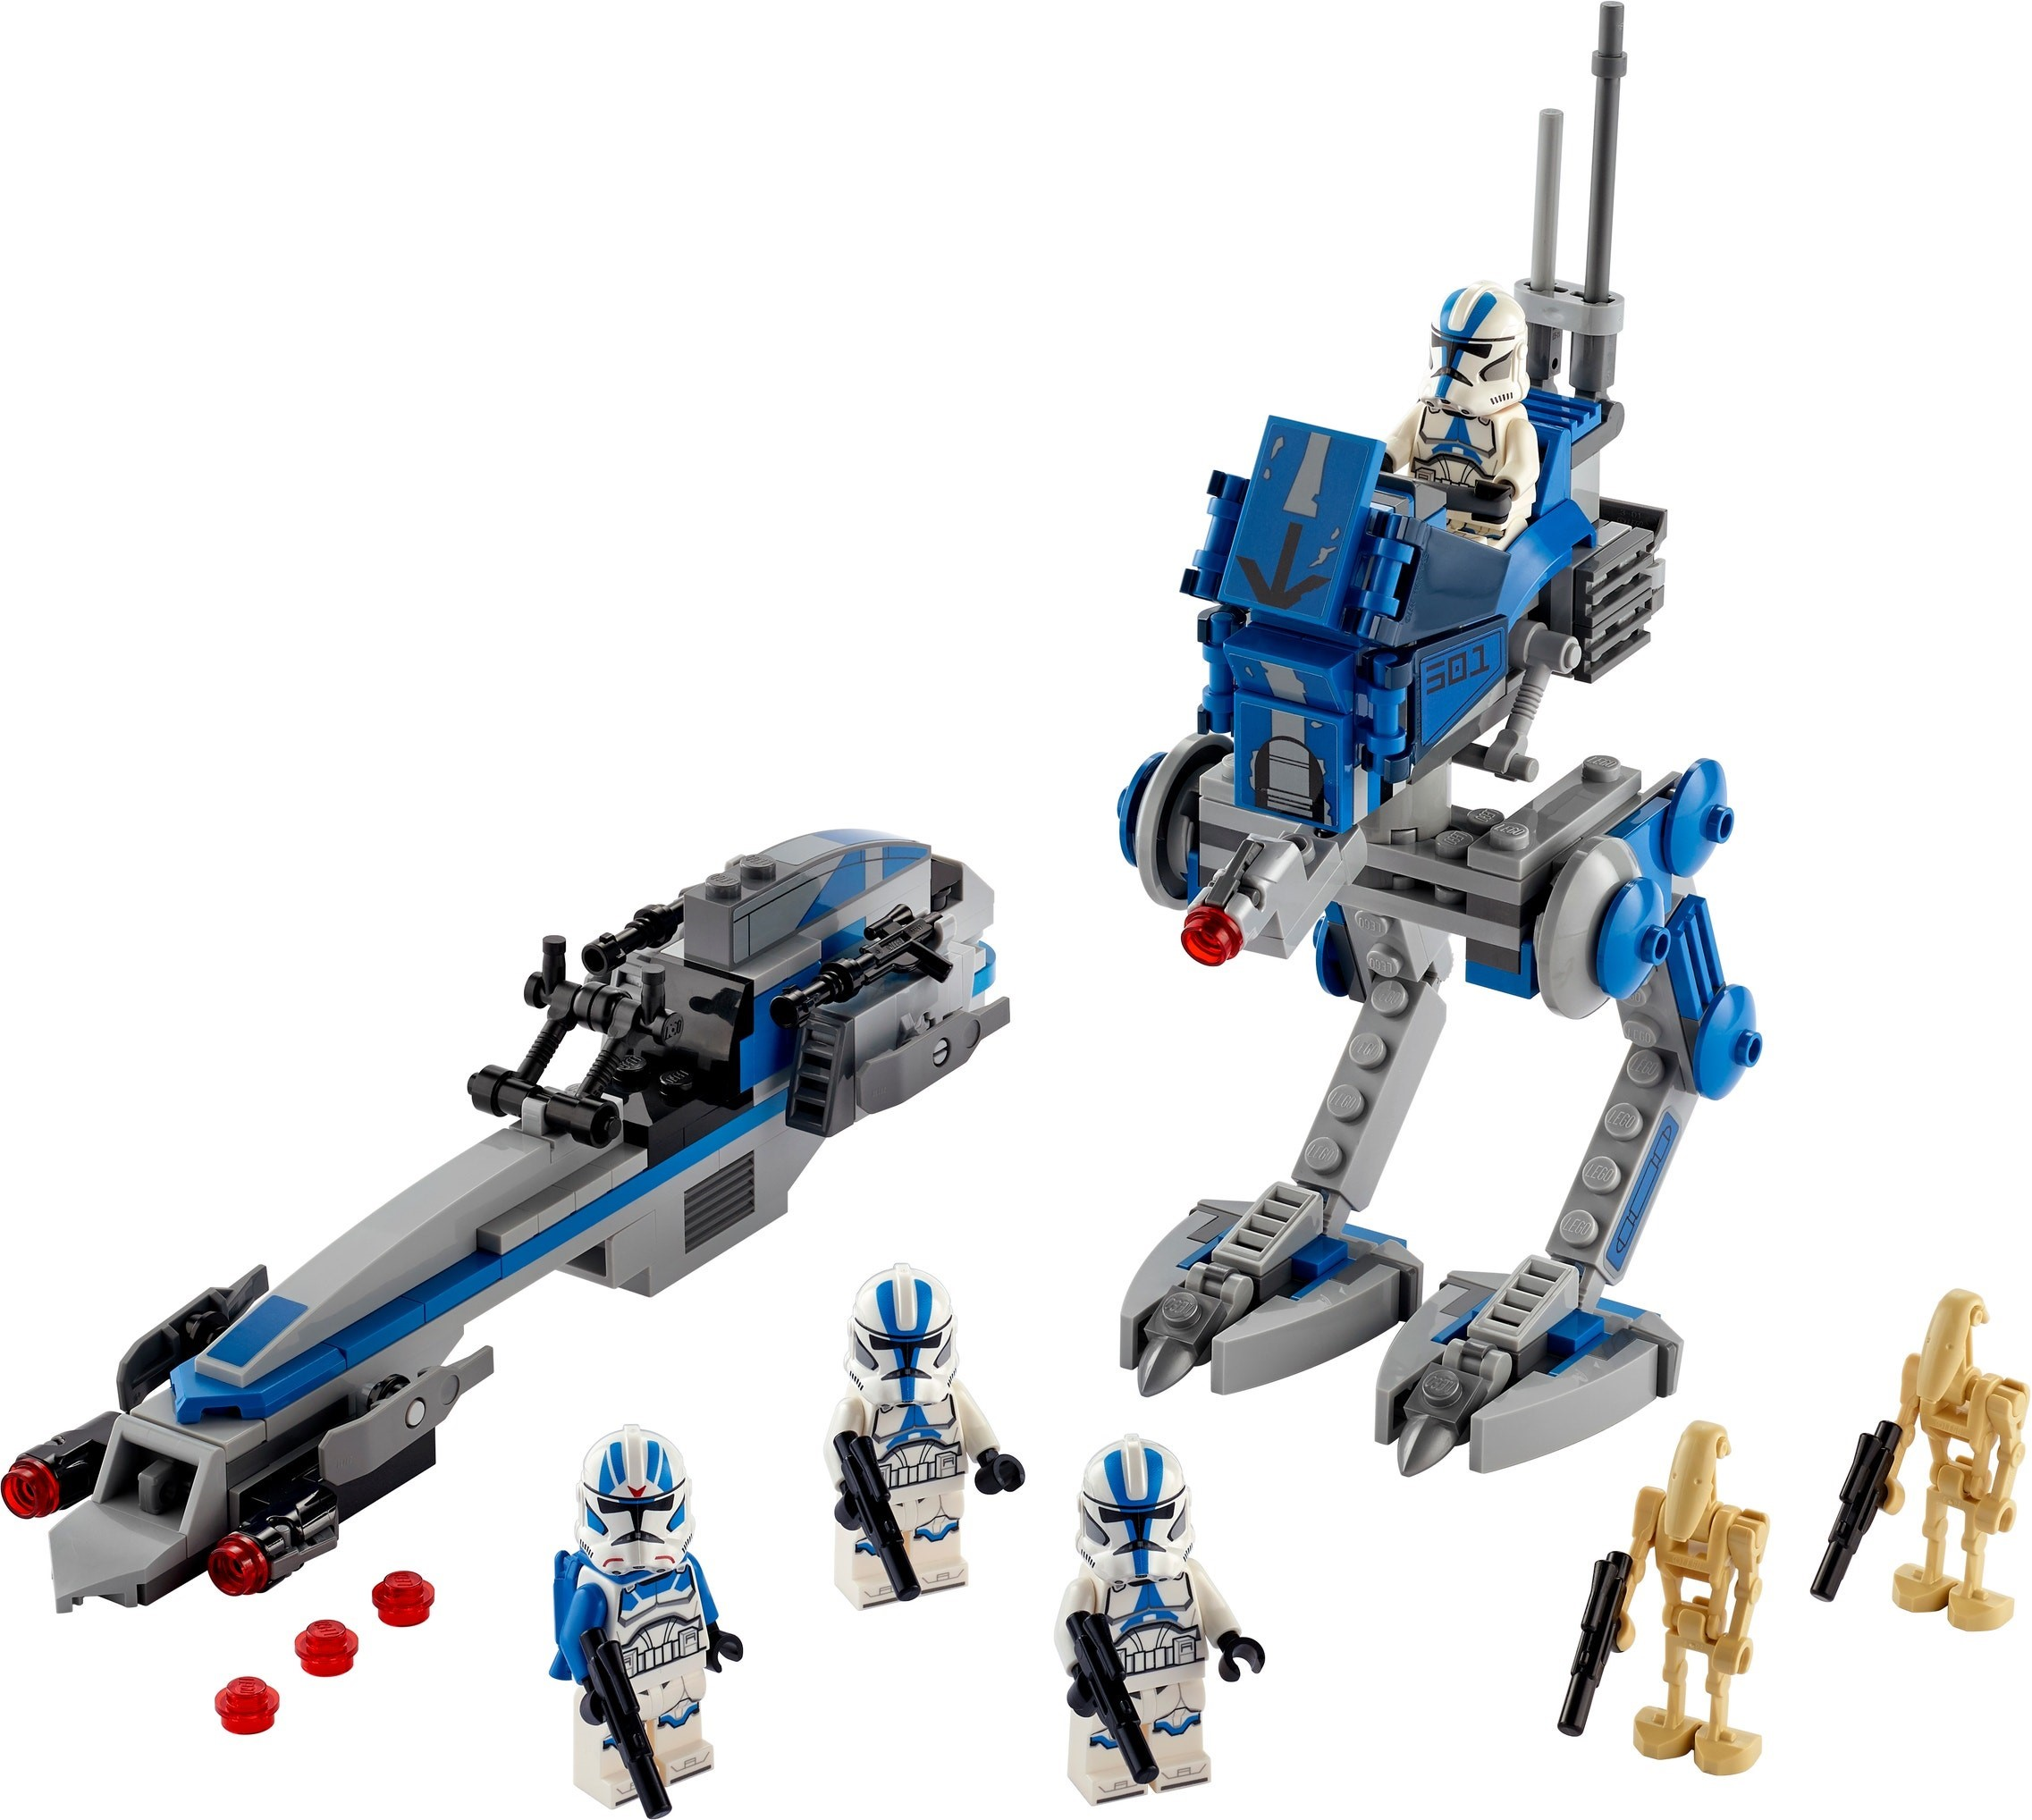 lego star wars 2020 501st legion clone troopers